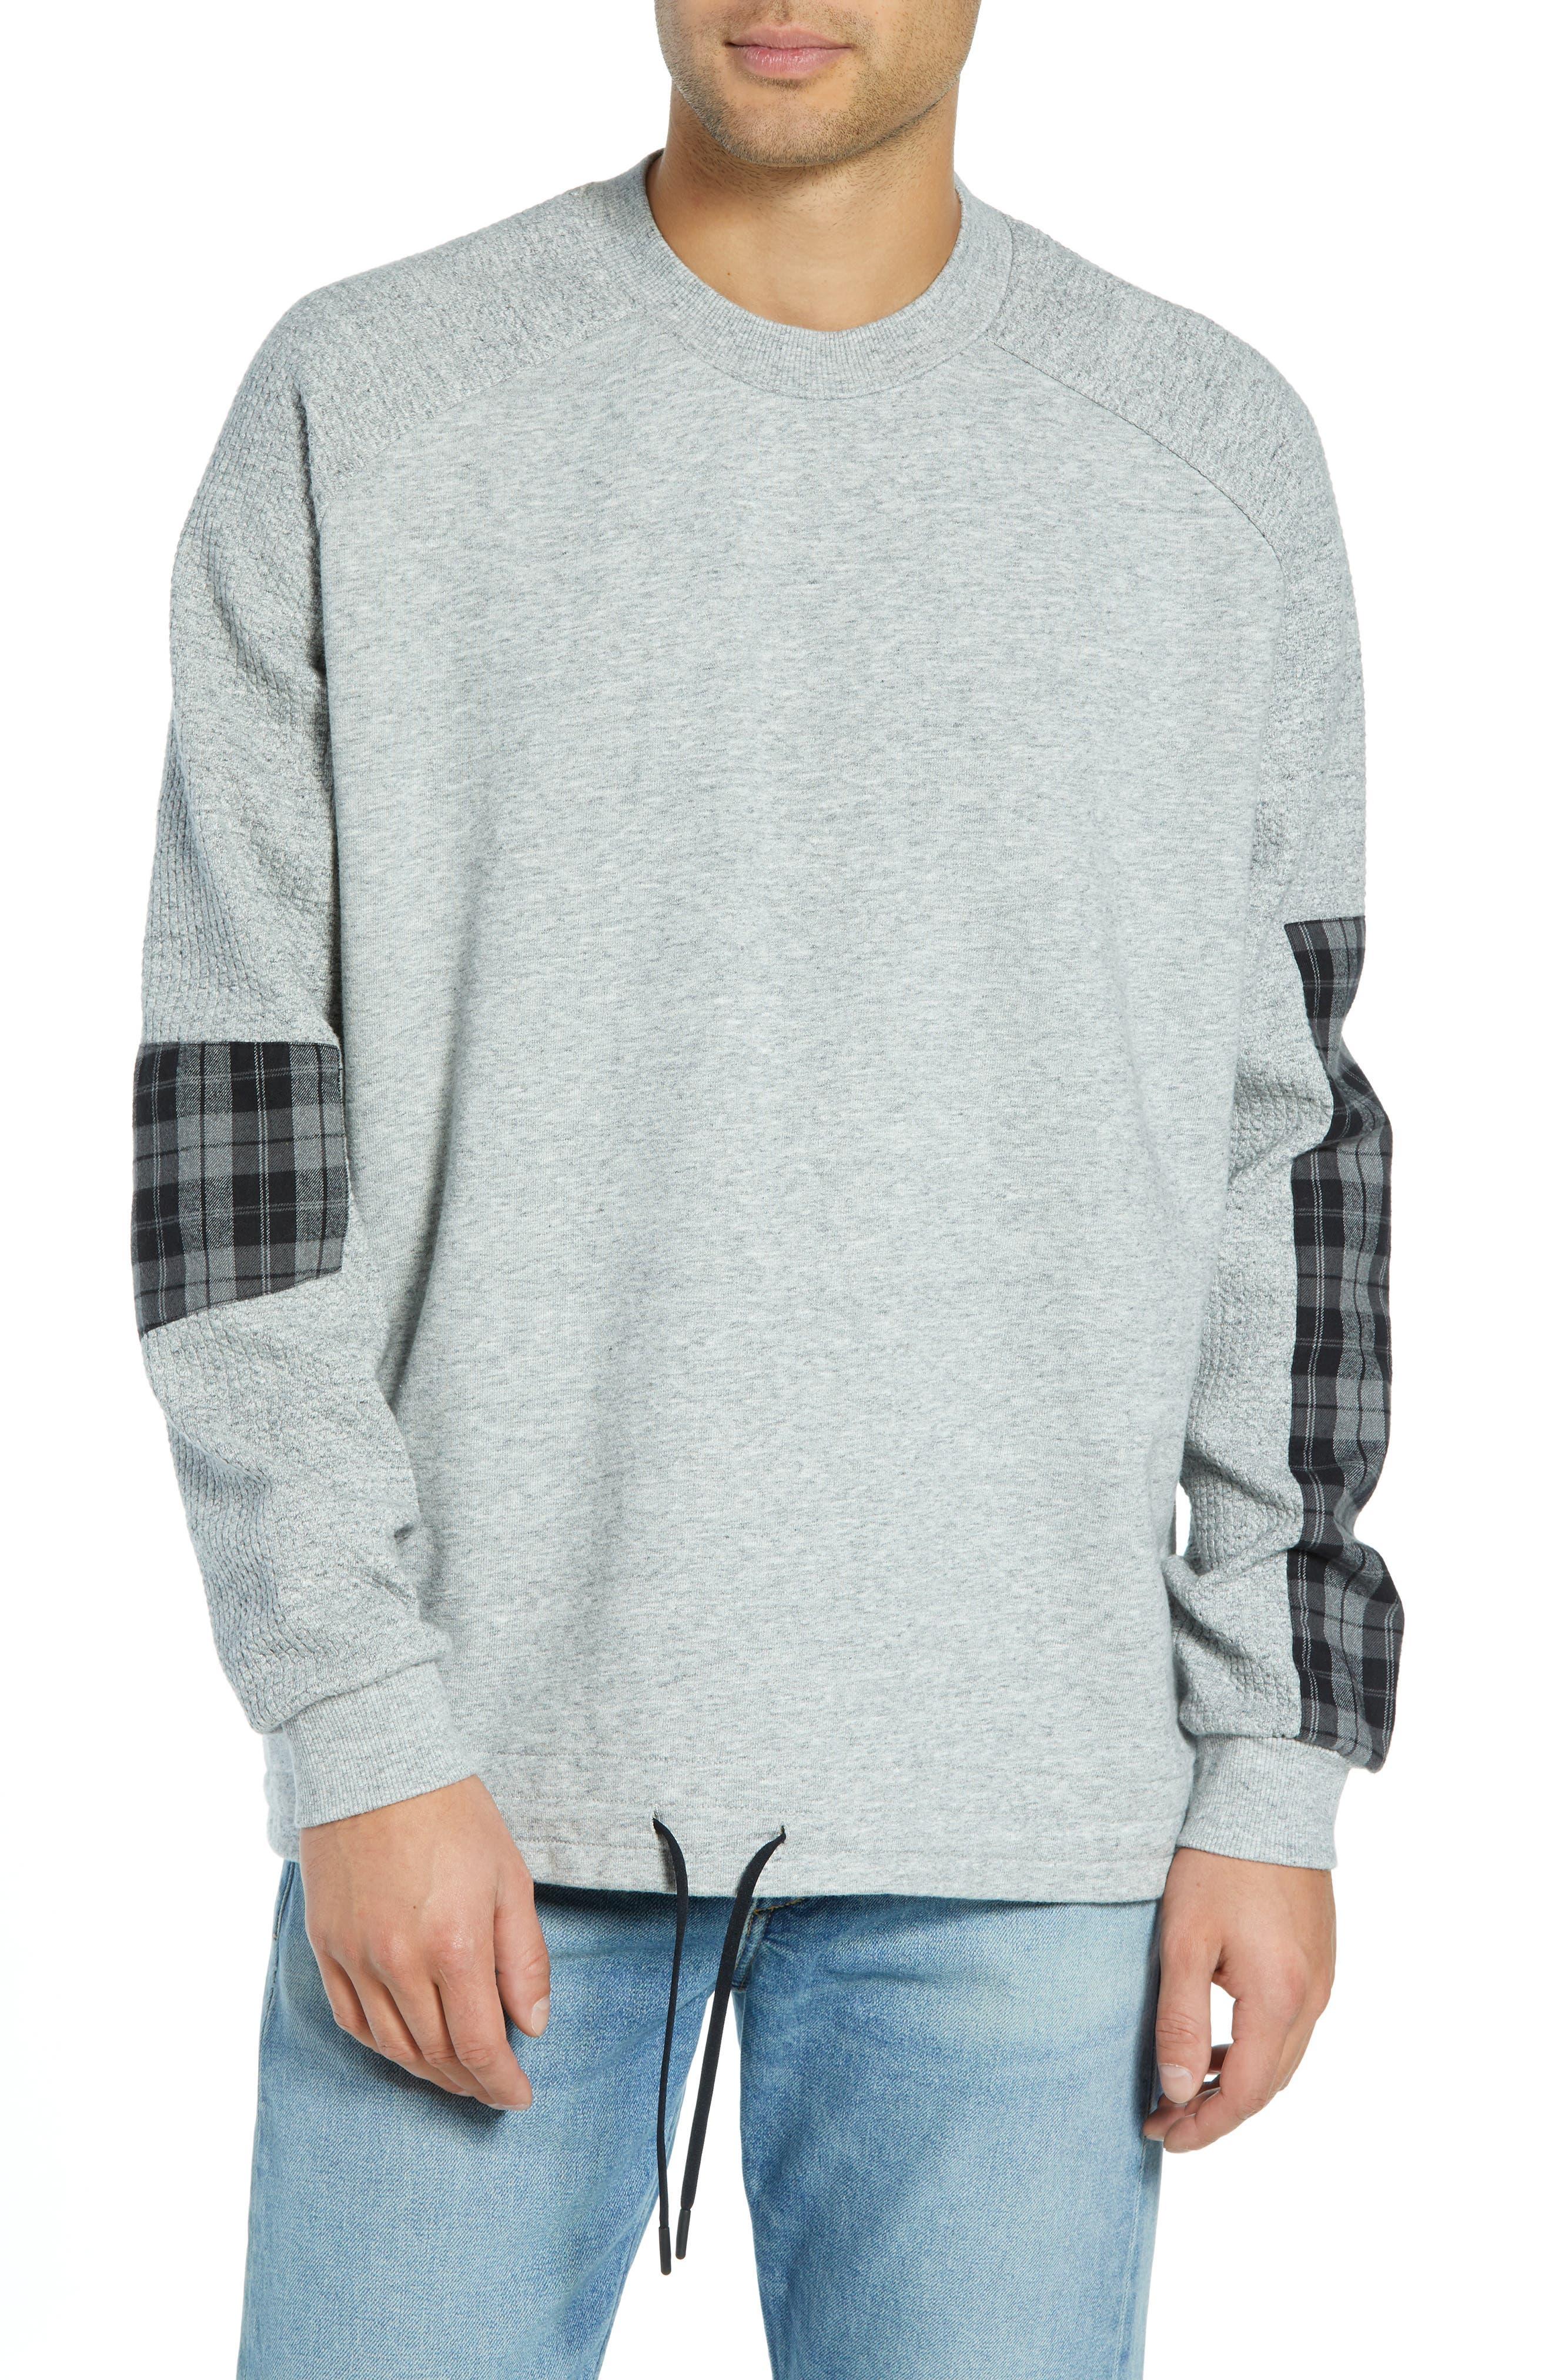 Media Rugger Sweatshirt,                         Main,                         color, 030